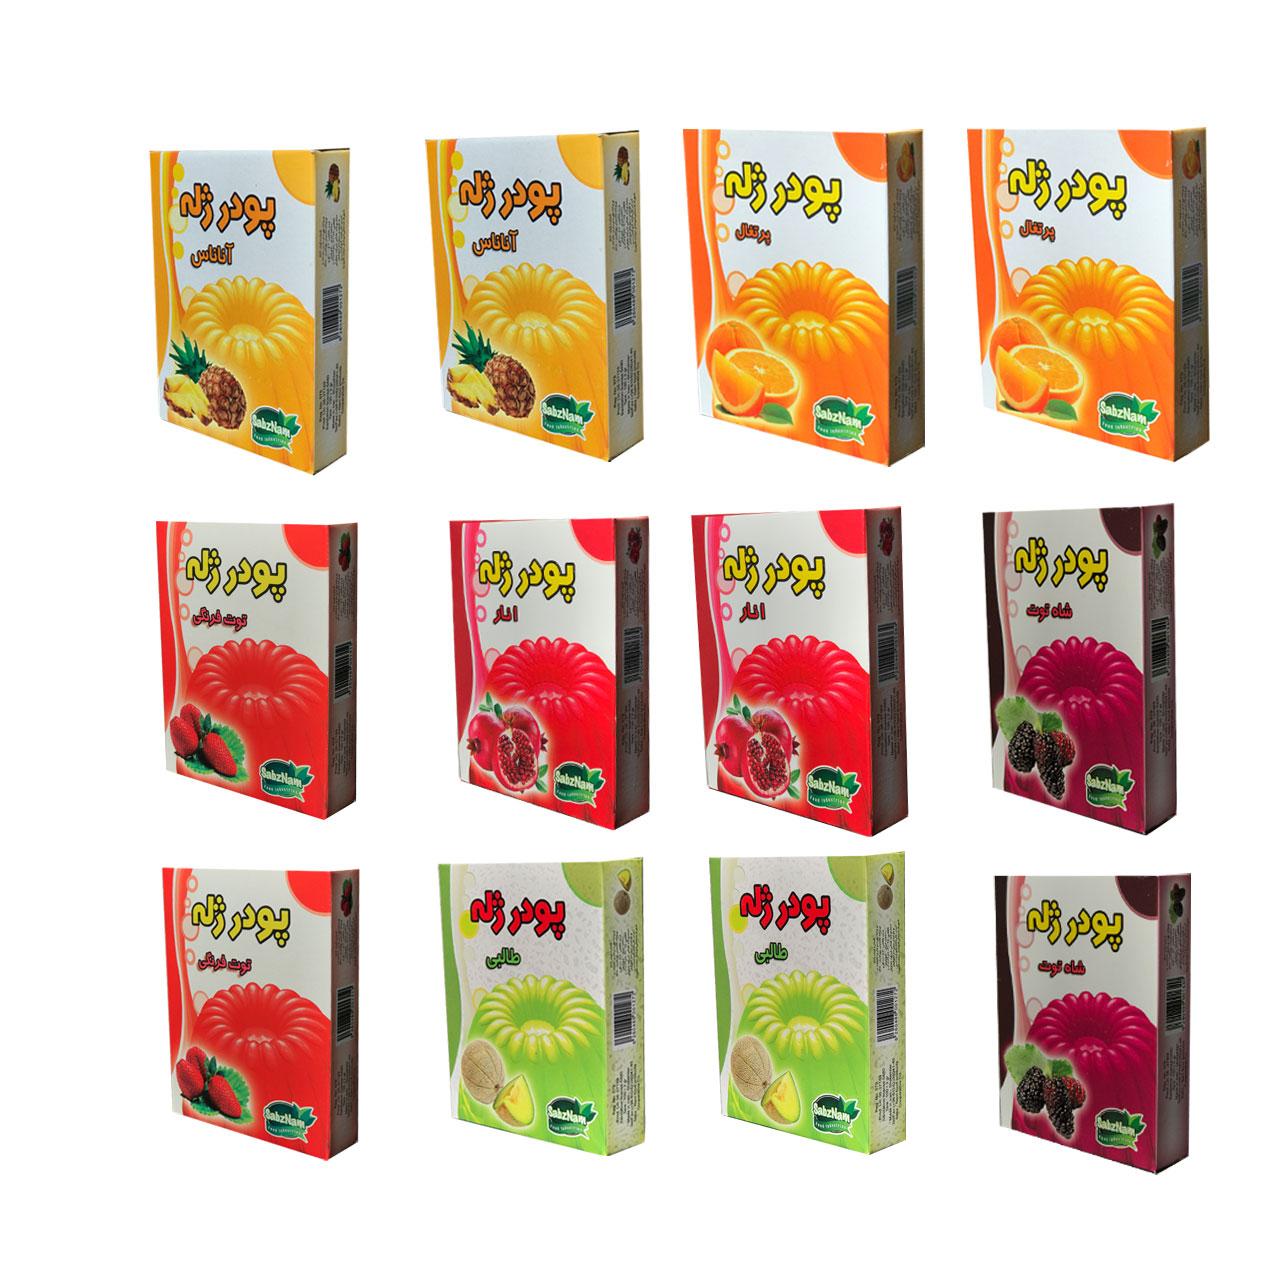 ژله مخلوط سبزنام-100گرم  مجموعه 12 عددی